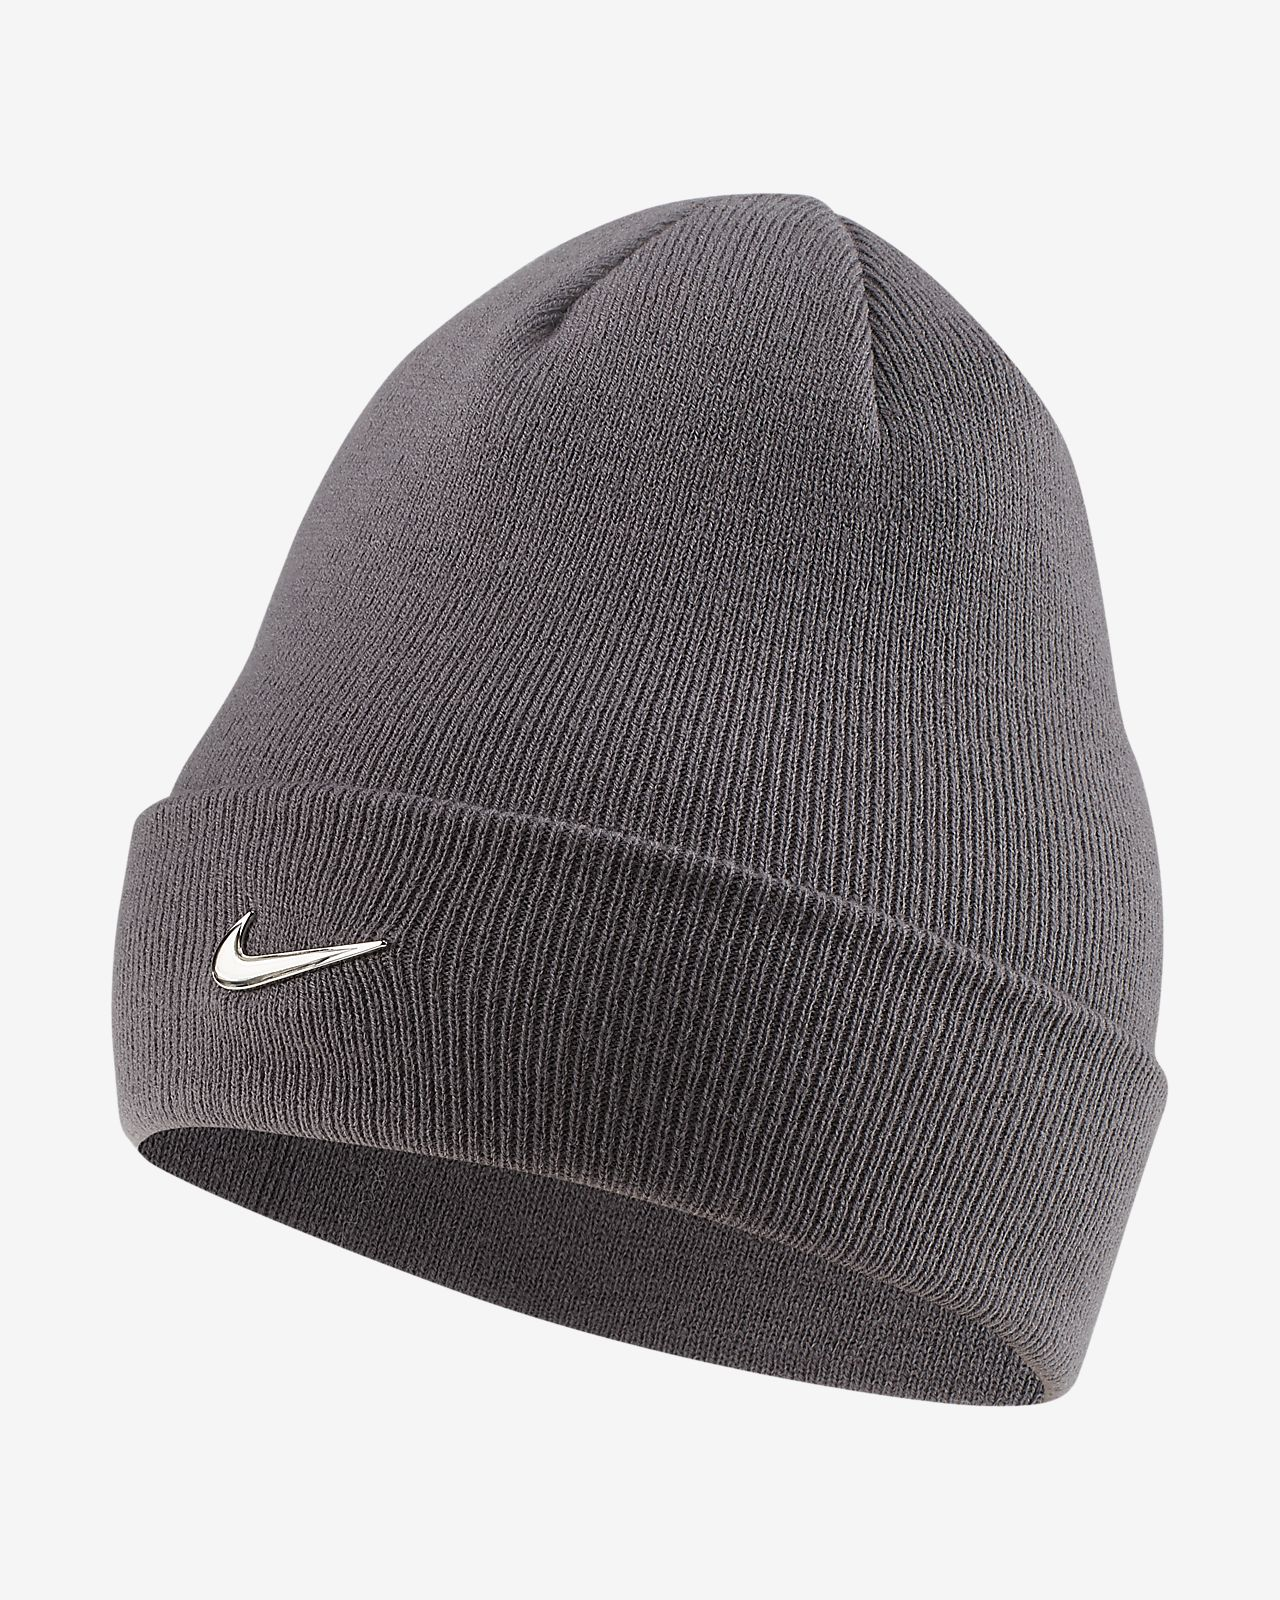 Nike Gorro - Niño/a